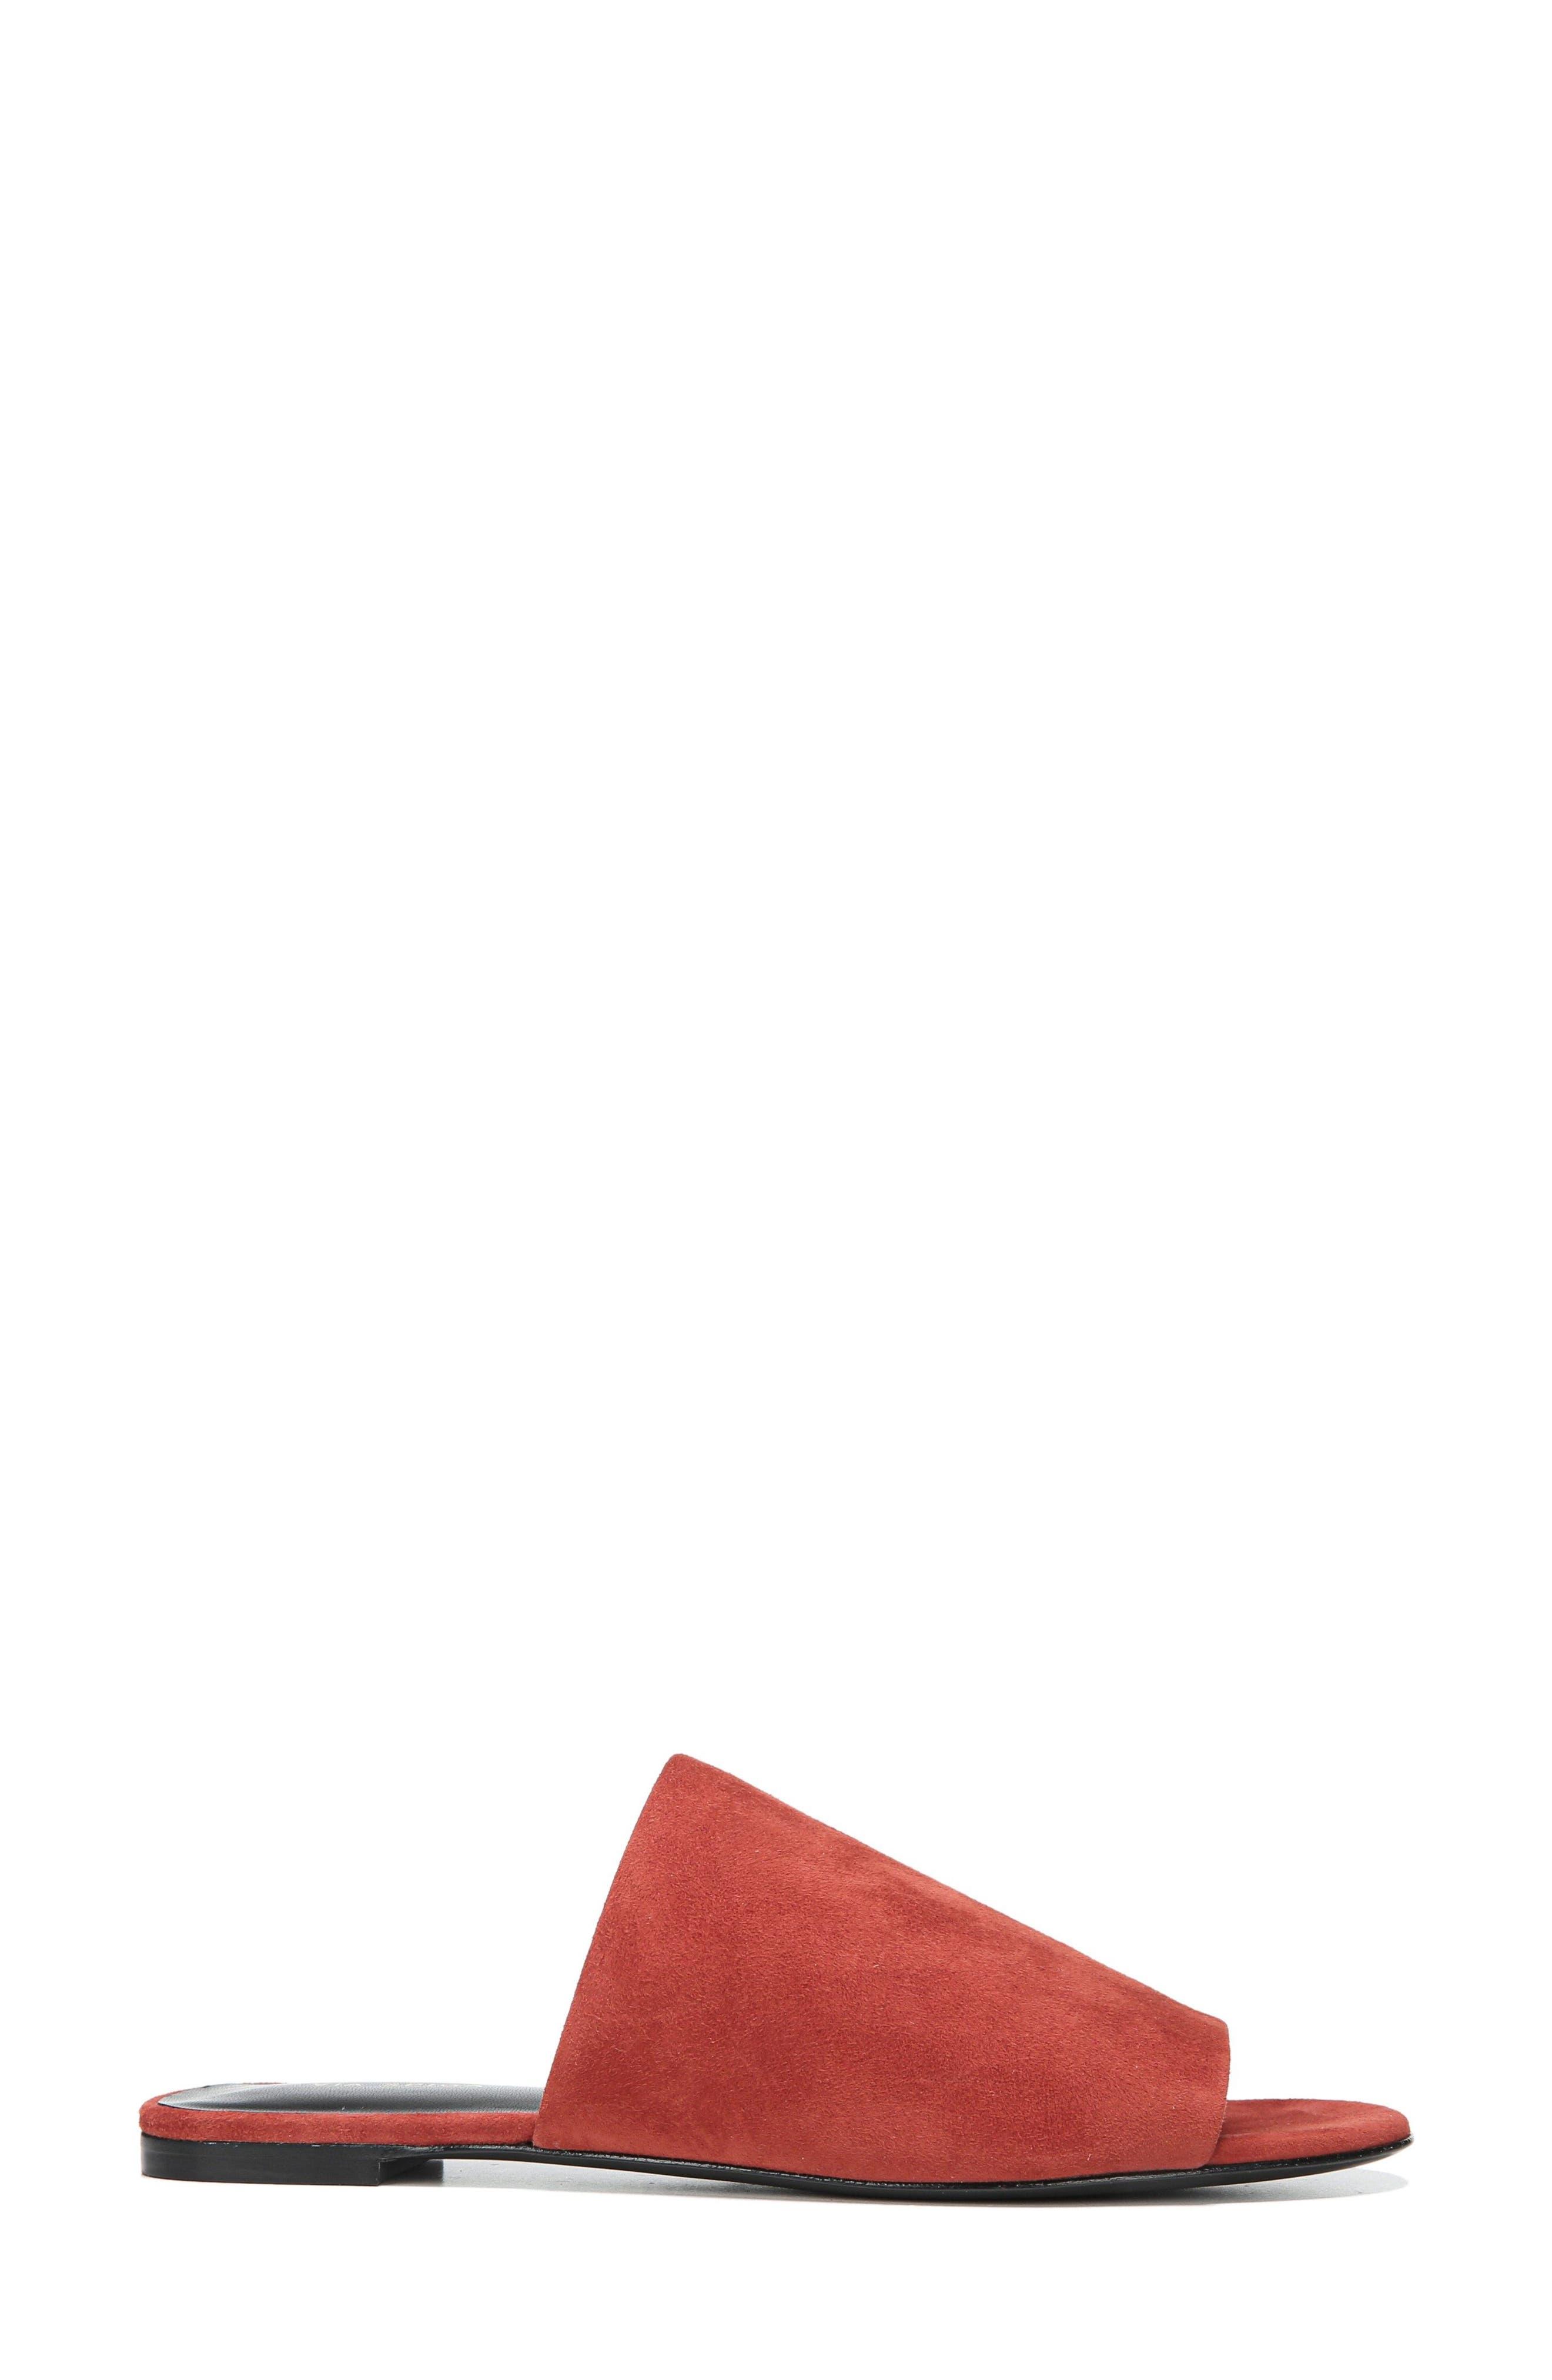 Heather Slide Sandal,                             Alternate thumbnail 3, color,                             Brick Leather